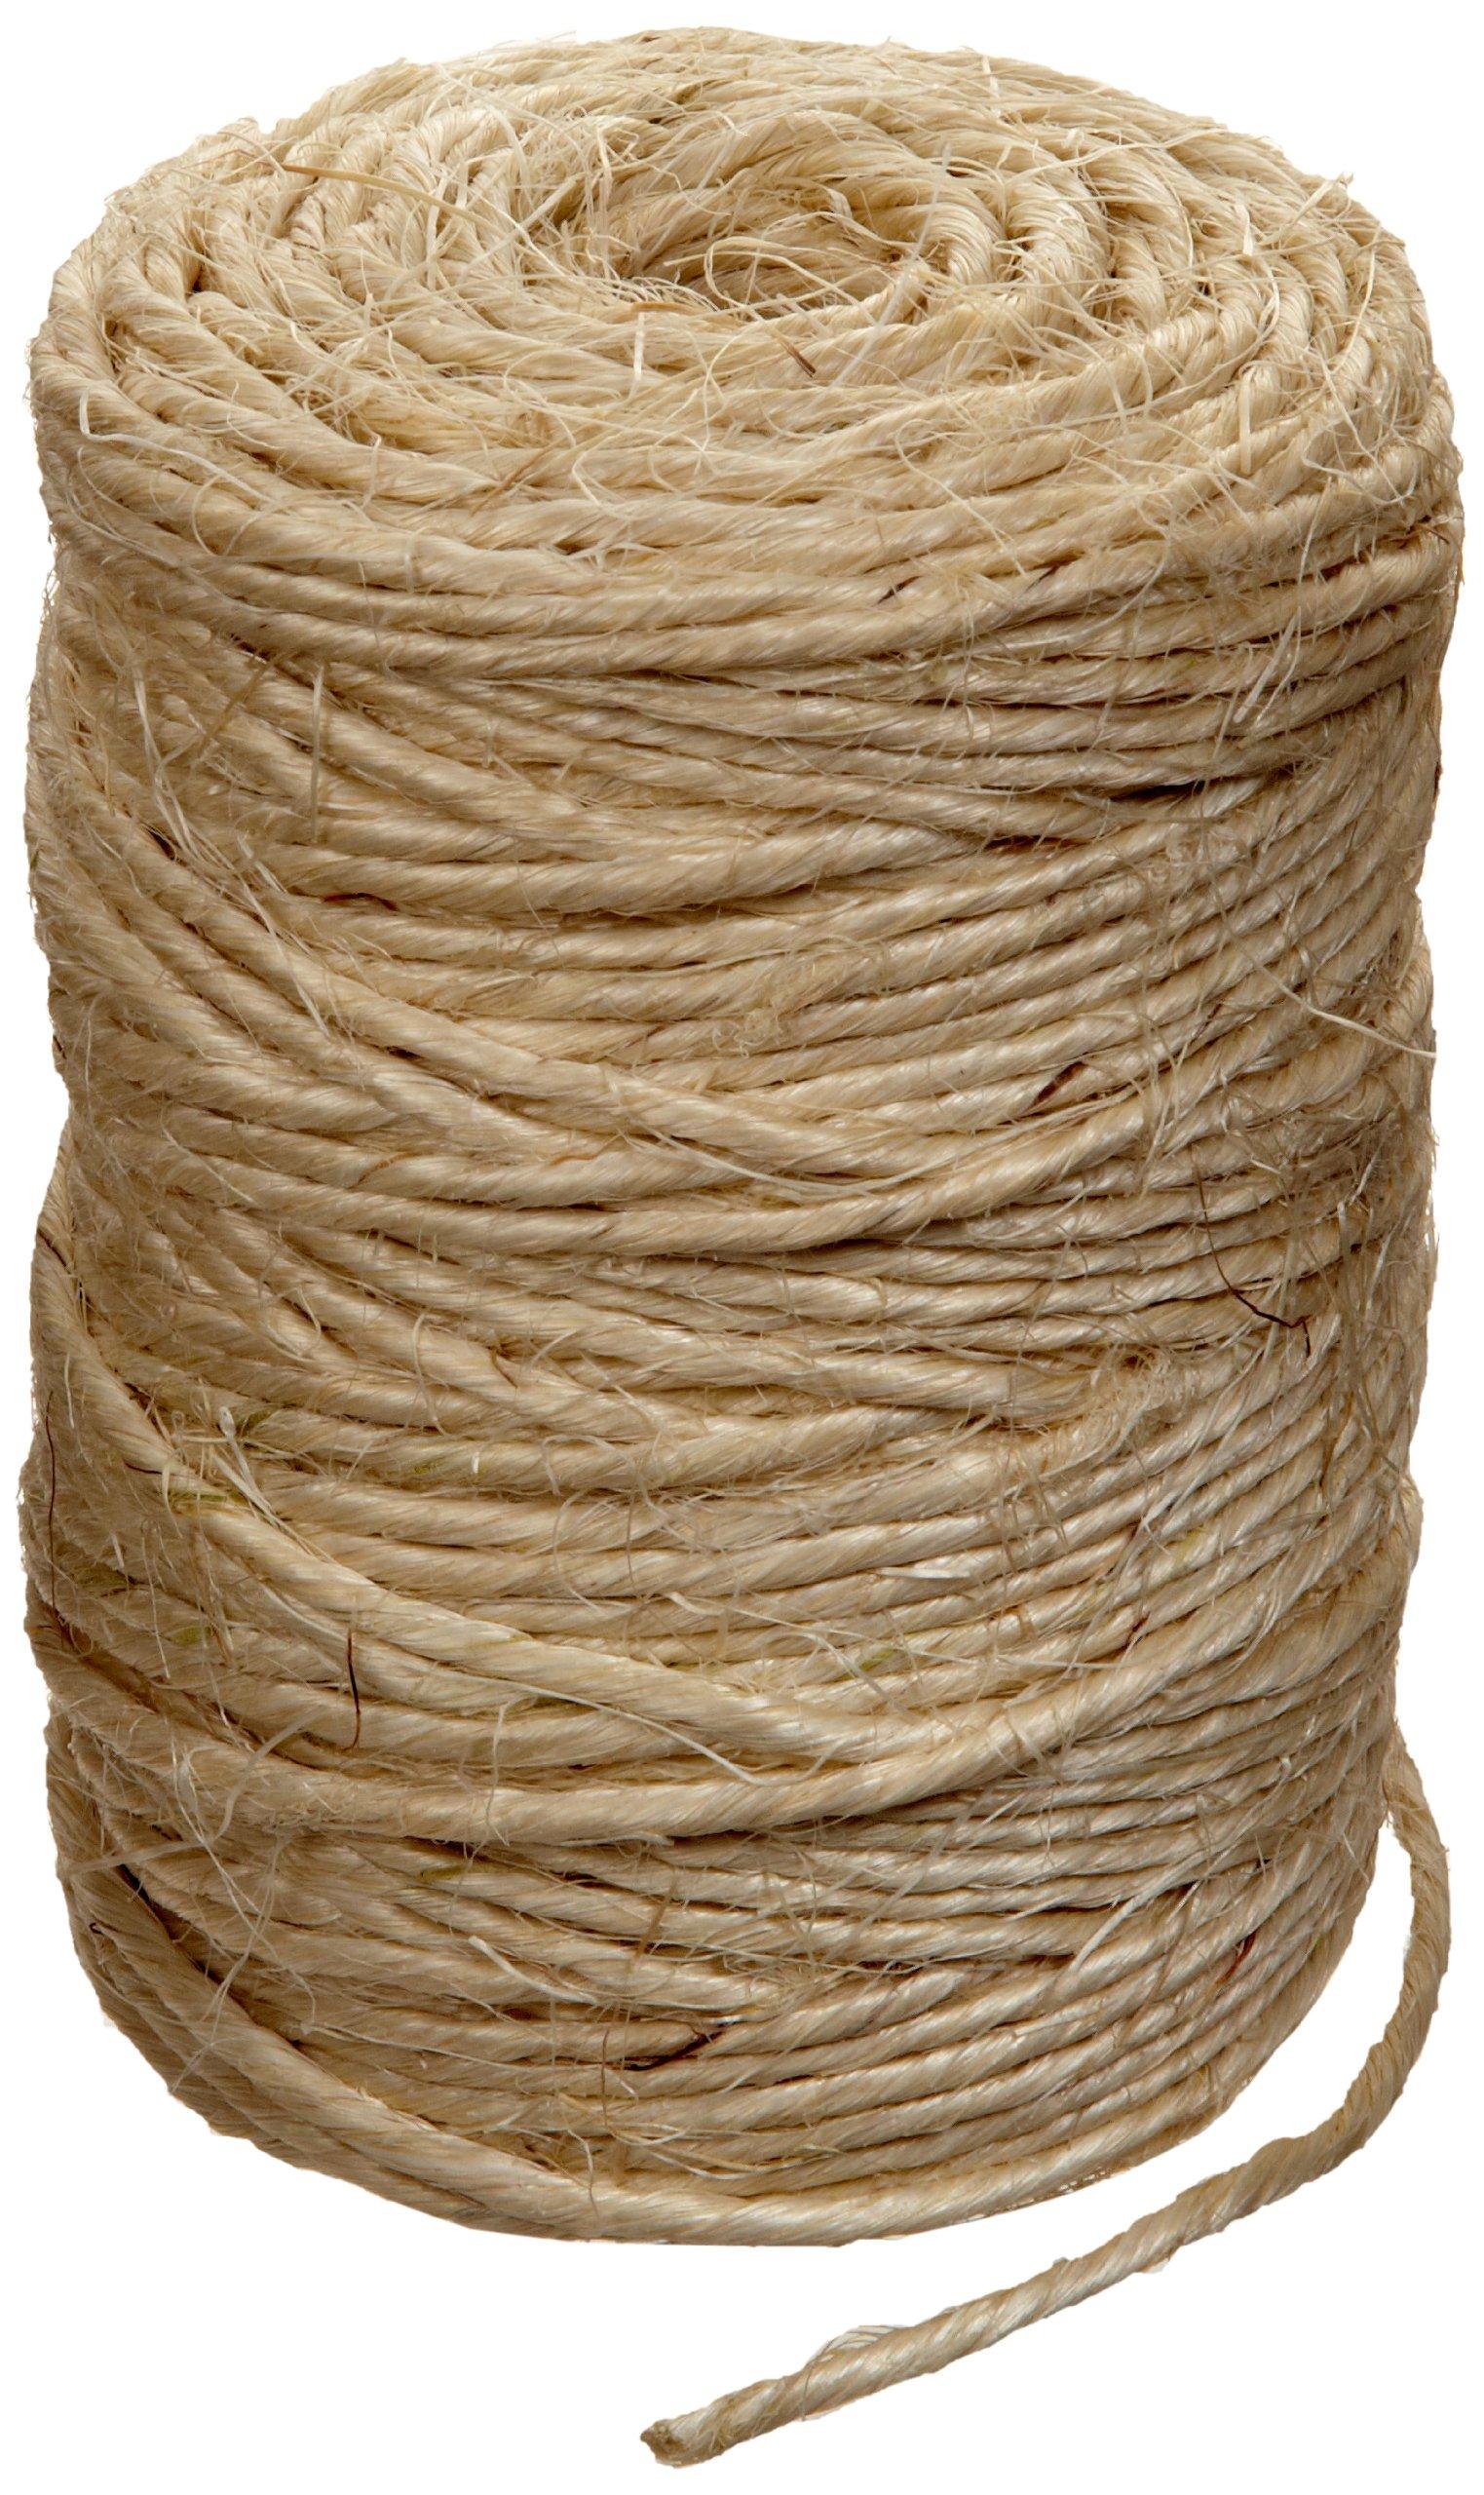 Rope King St 300 Sisal Twine 300 Feet | eBay